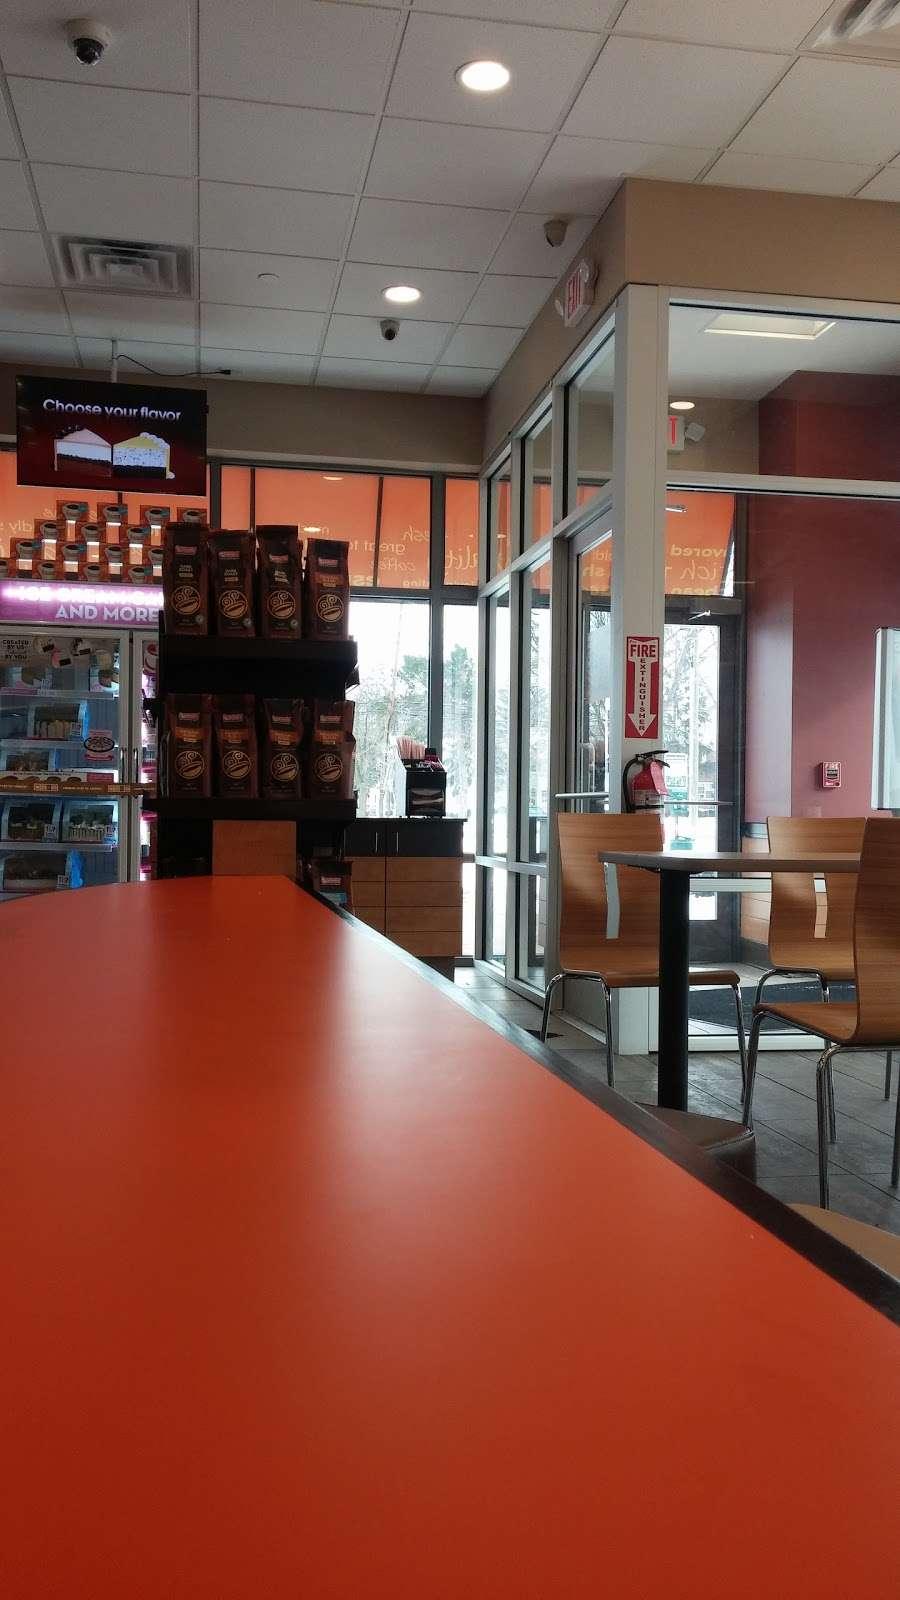 Baskin Robbins - store  | Photo 9 of 10 | Address: 699 Avalon Drive, Wood-Ridge, NJ 07075, USA